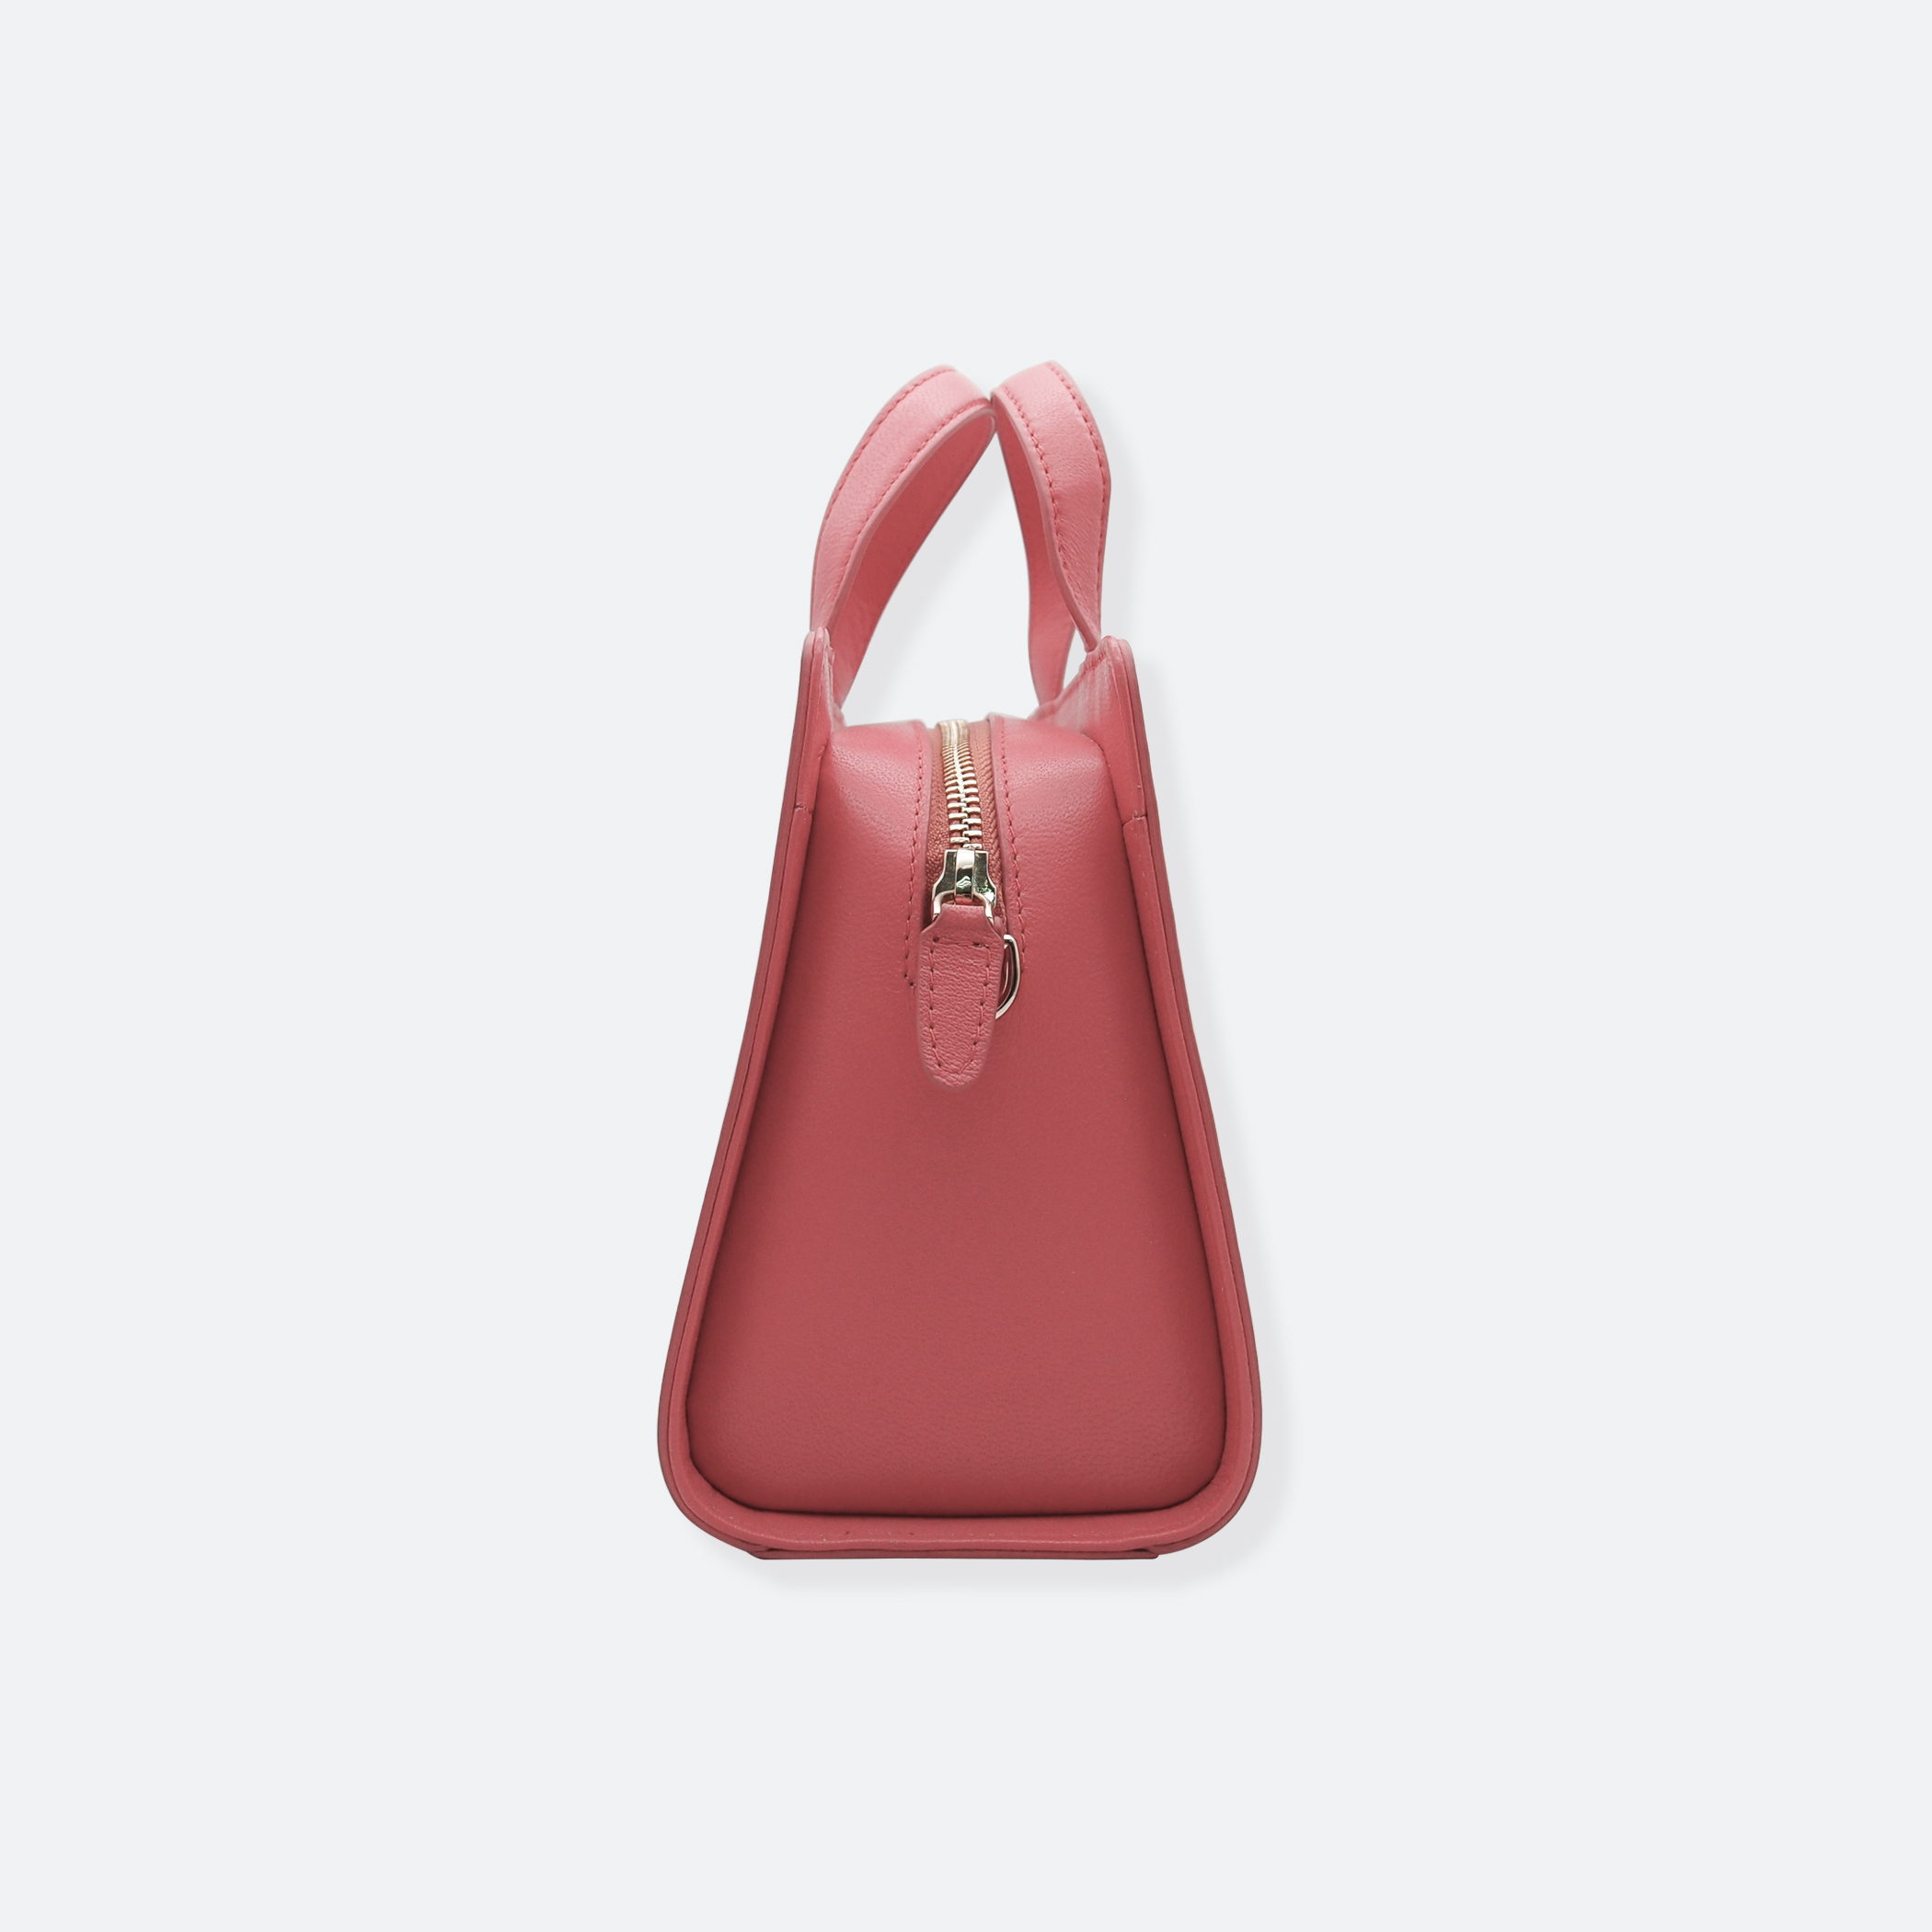 OhMart B043 (Pink) 2